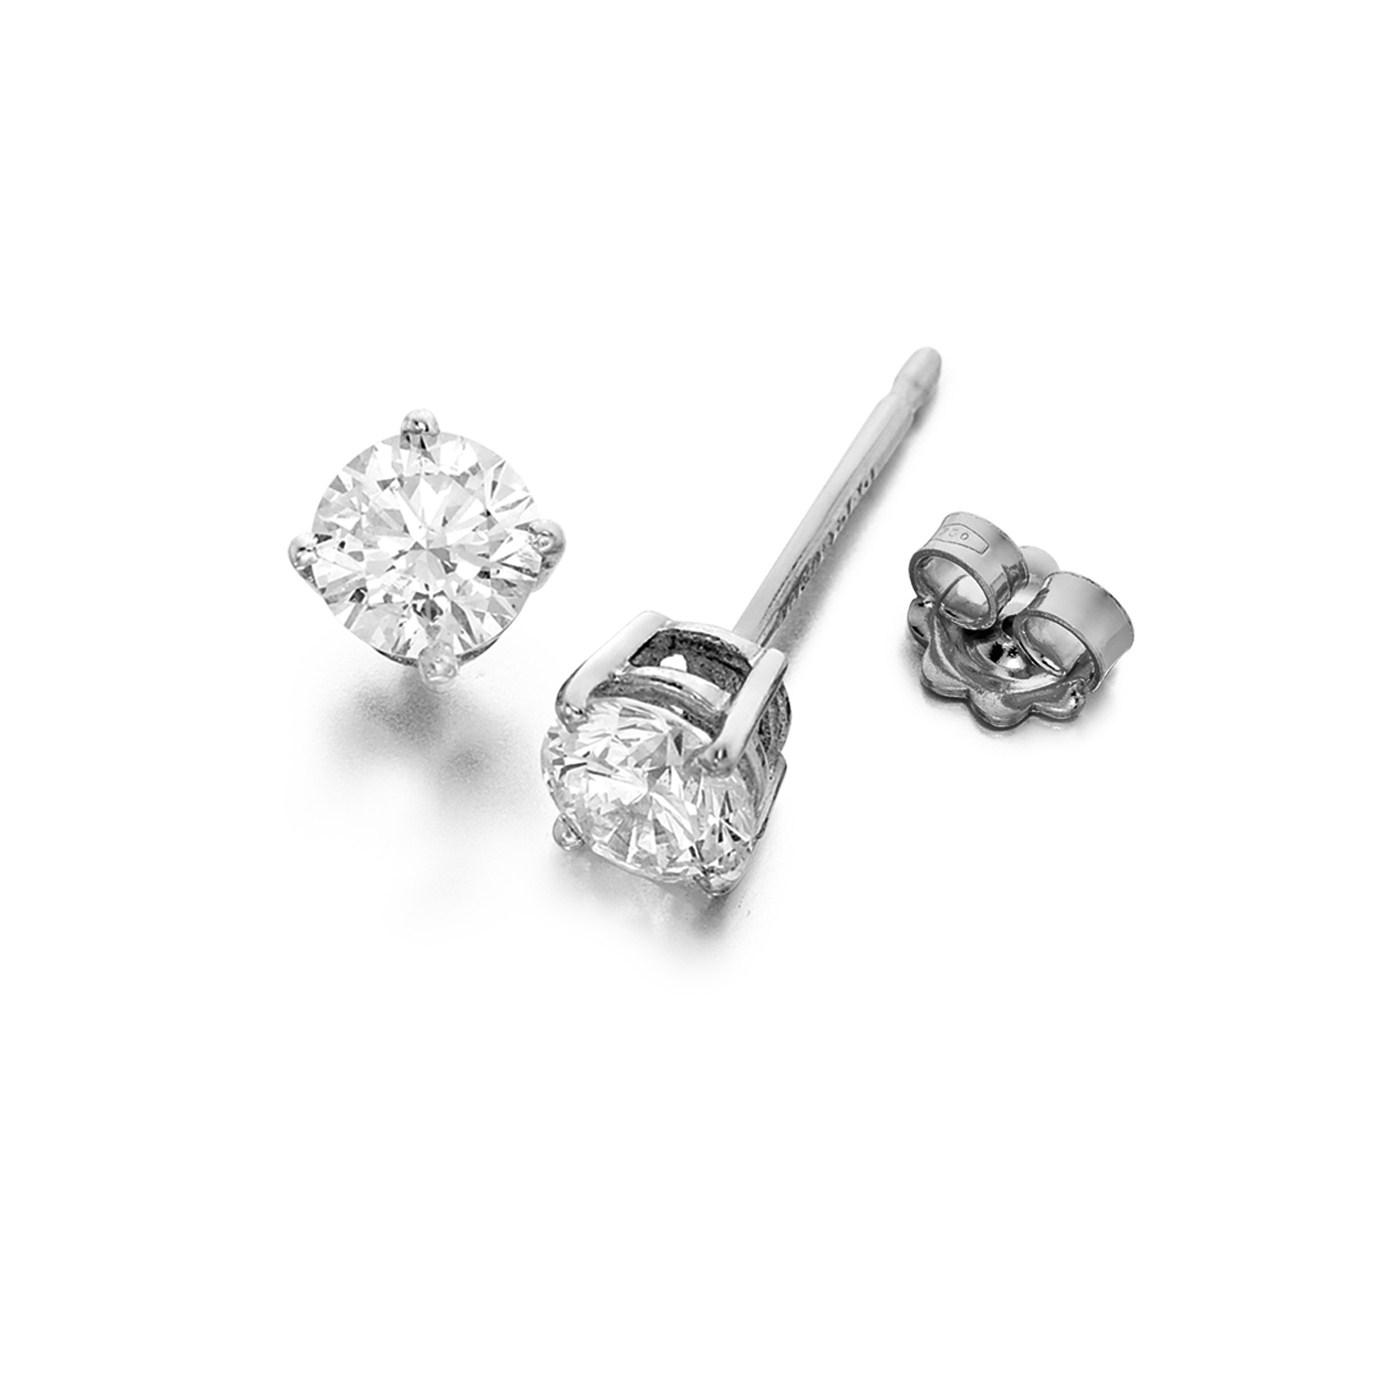 18ct White Gold Diamond Studs 0.60ct